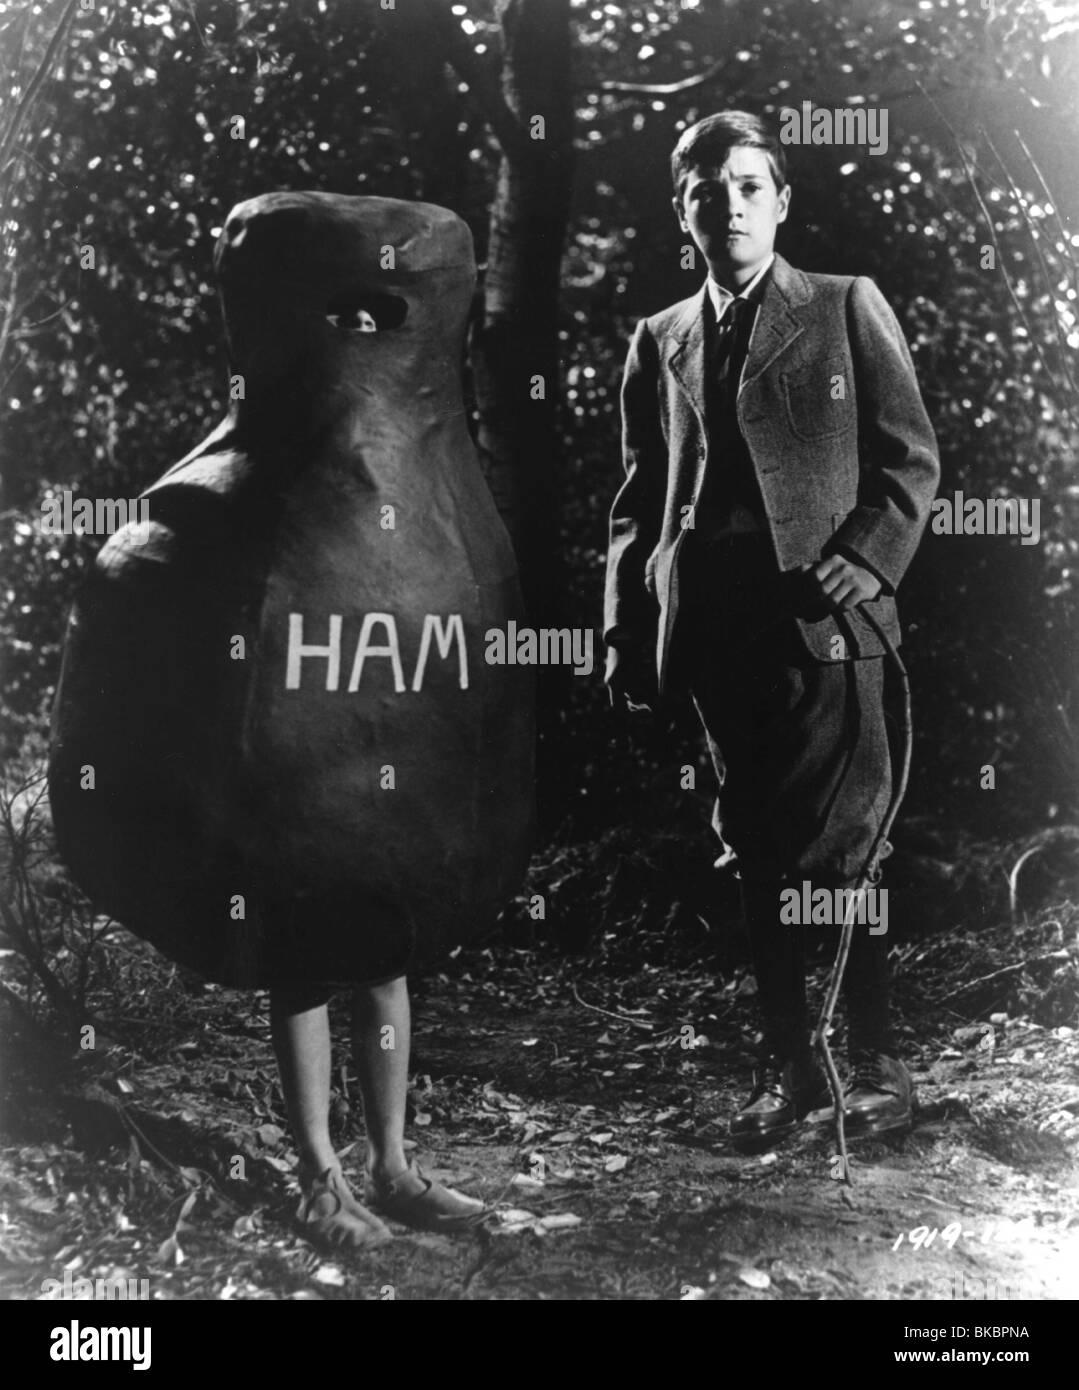 TO KILL A MOCKINGBIRD (1962) MARY BADHAM, PHILLIP ALFORD TKM 008P - Stock Image